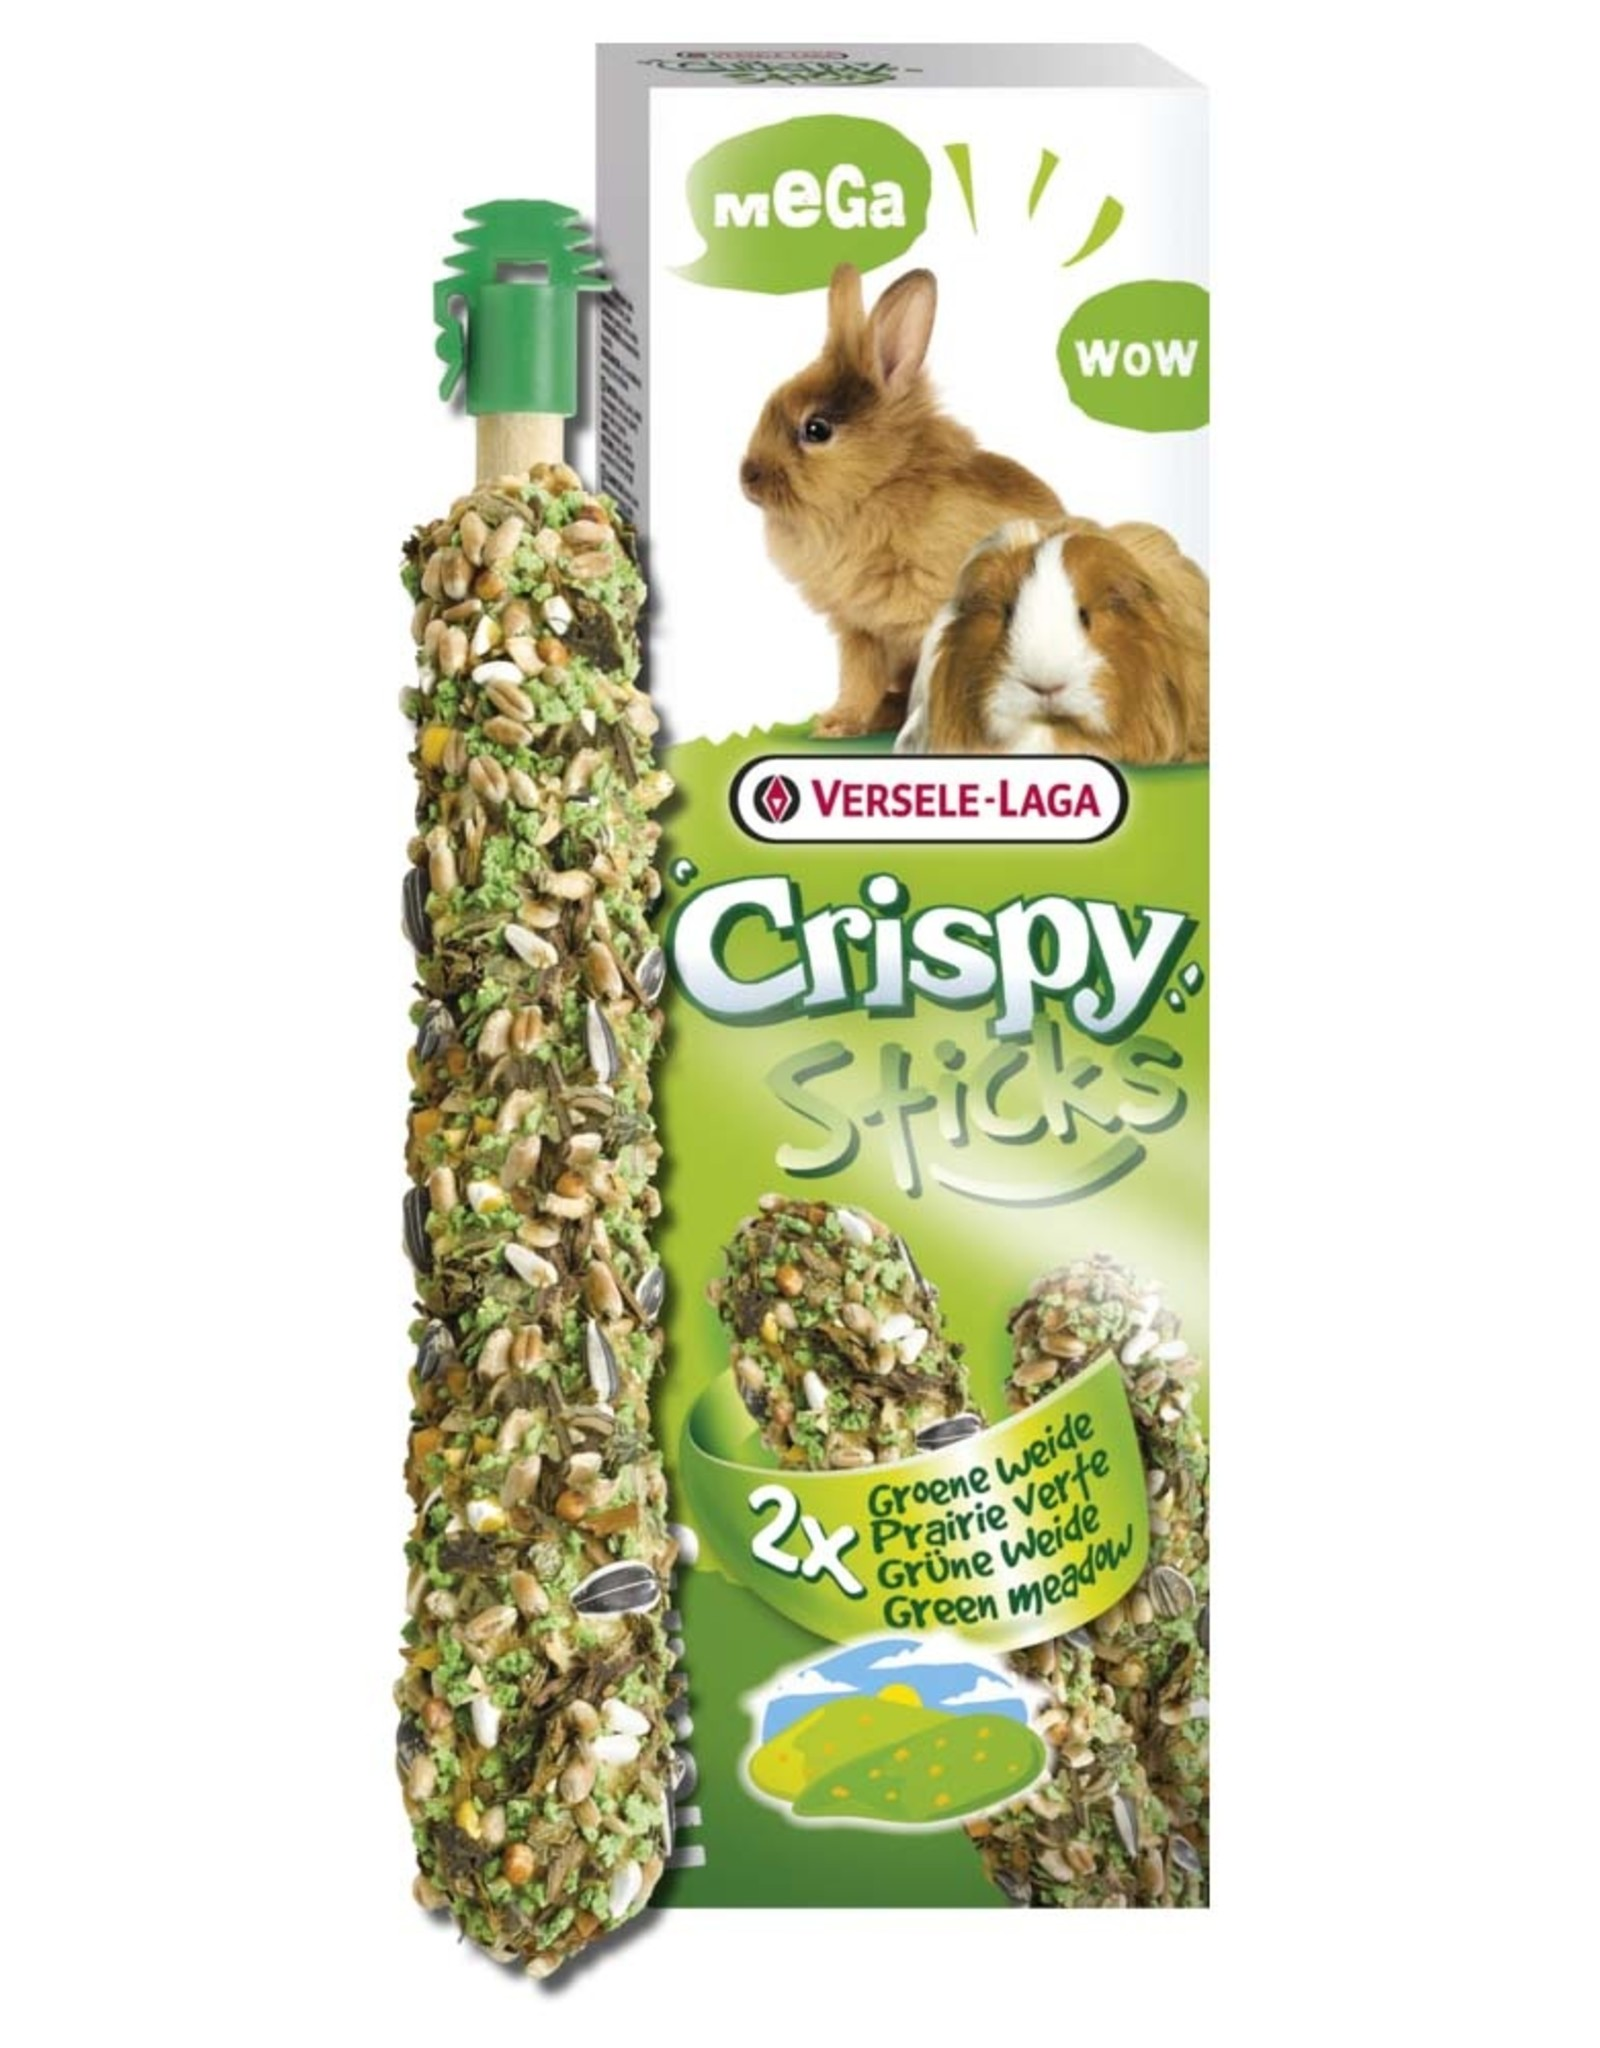 Versele-Laga Crispy Sticks Mega - Rabbit & Guinea Pig